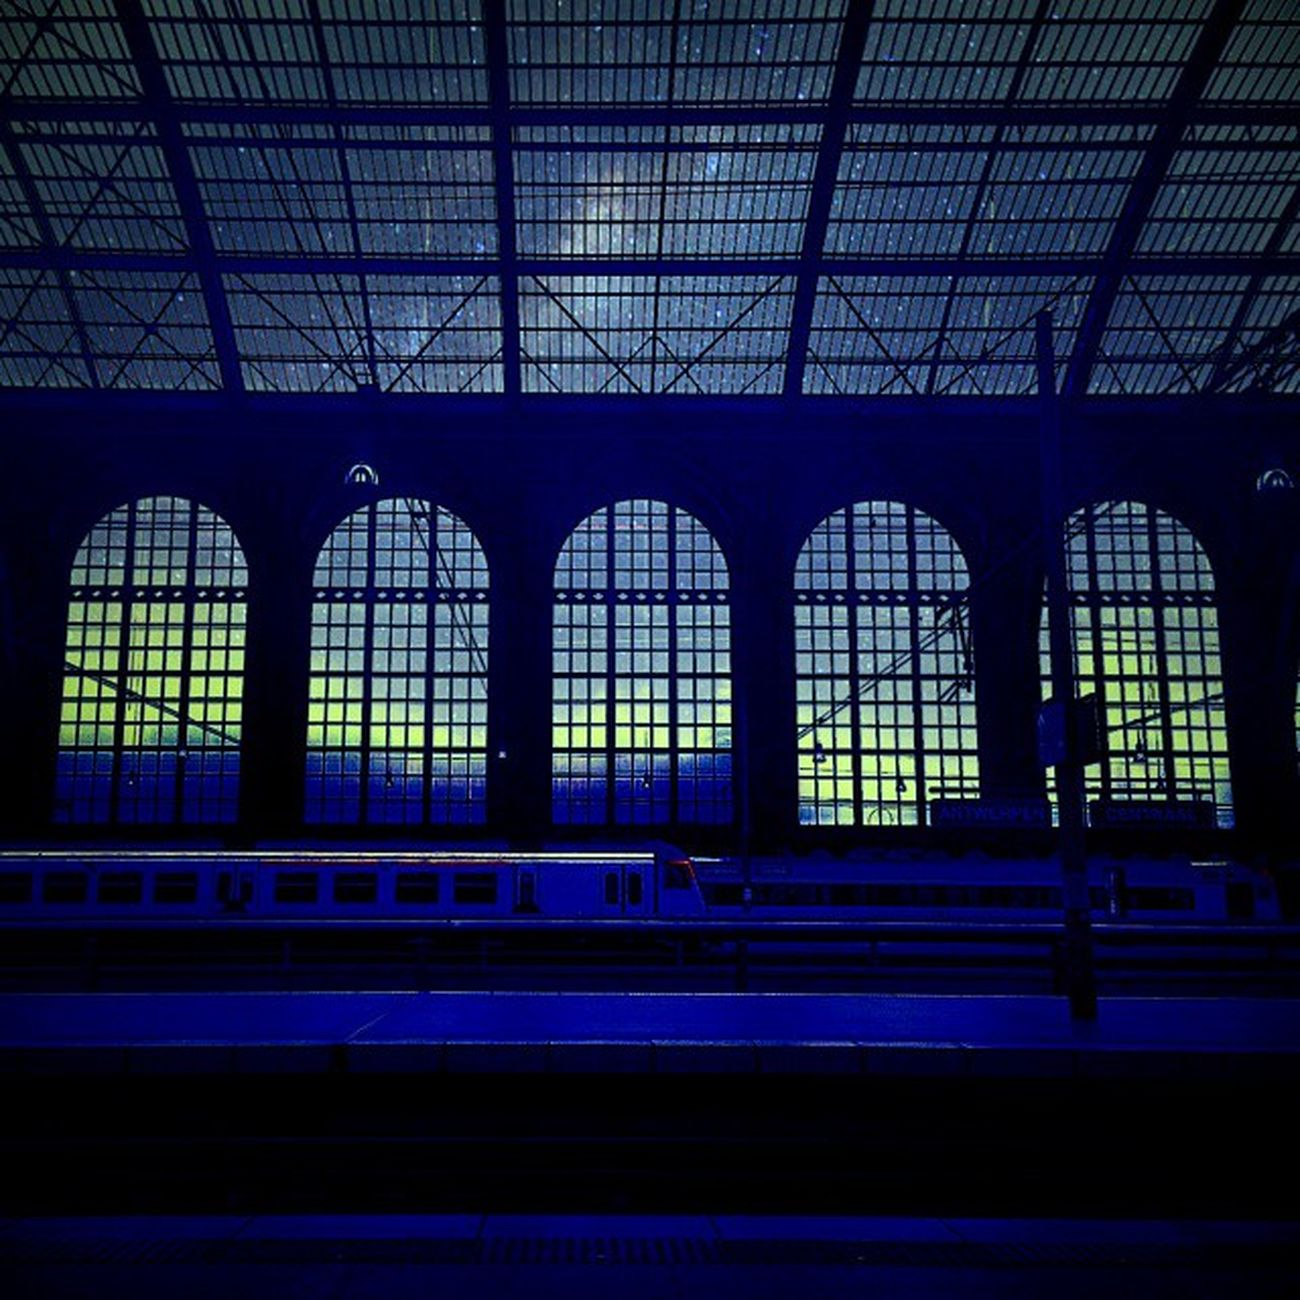 Antwerpencentraalstation Station Trainstation Train bluesky blue Anvers antwerpencentraal night nighttrain belgium Belgique oneplusone onepluslife oneplus oneplusonephotography instagood instagram picoftheday roof windows